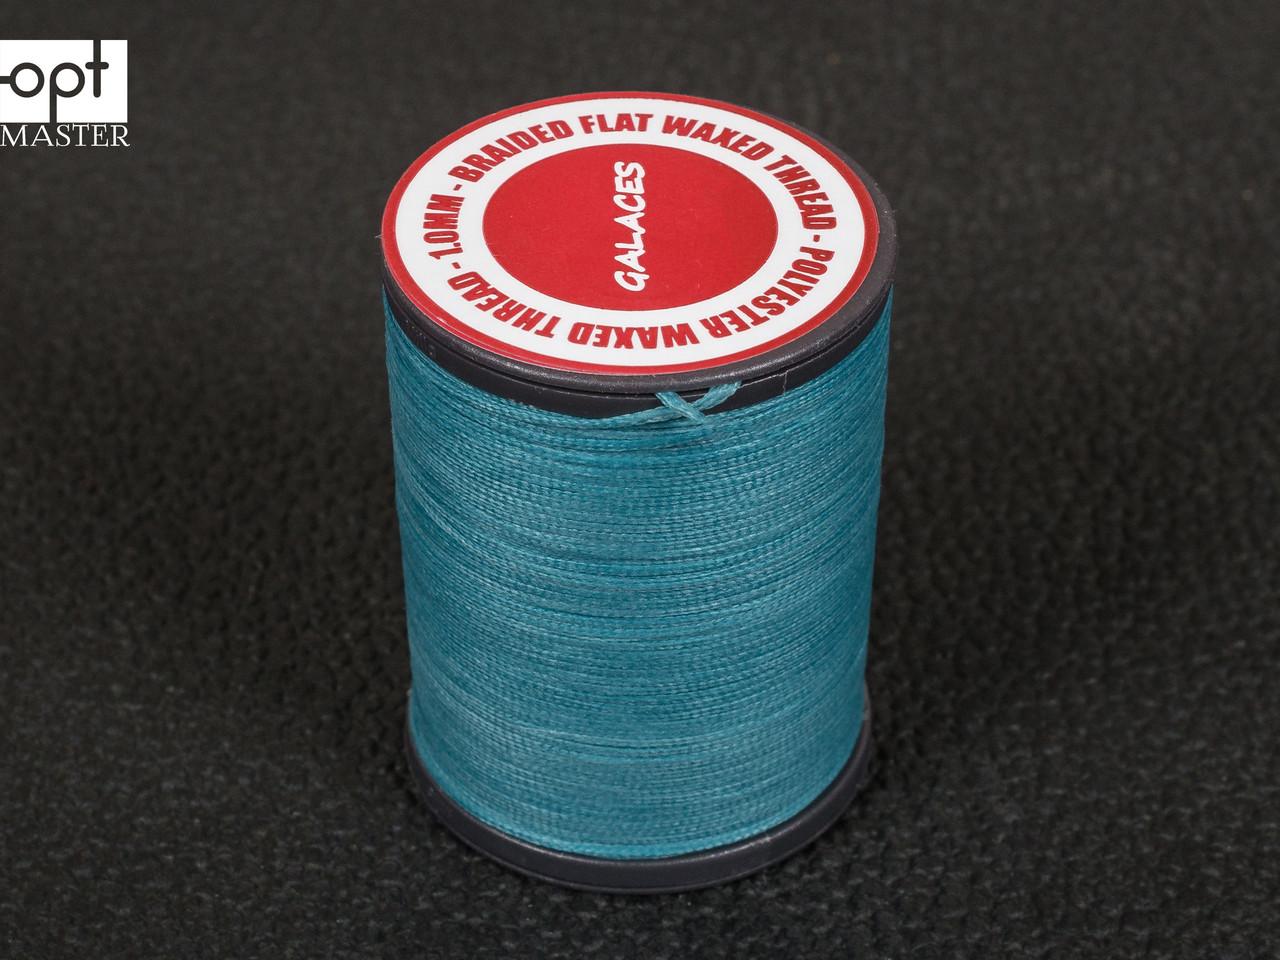 Galaces 1.00мм светло-синий (S067) плоский шнур вощёный по коже